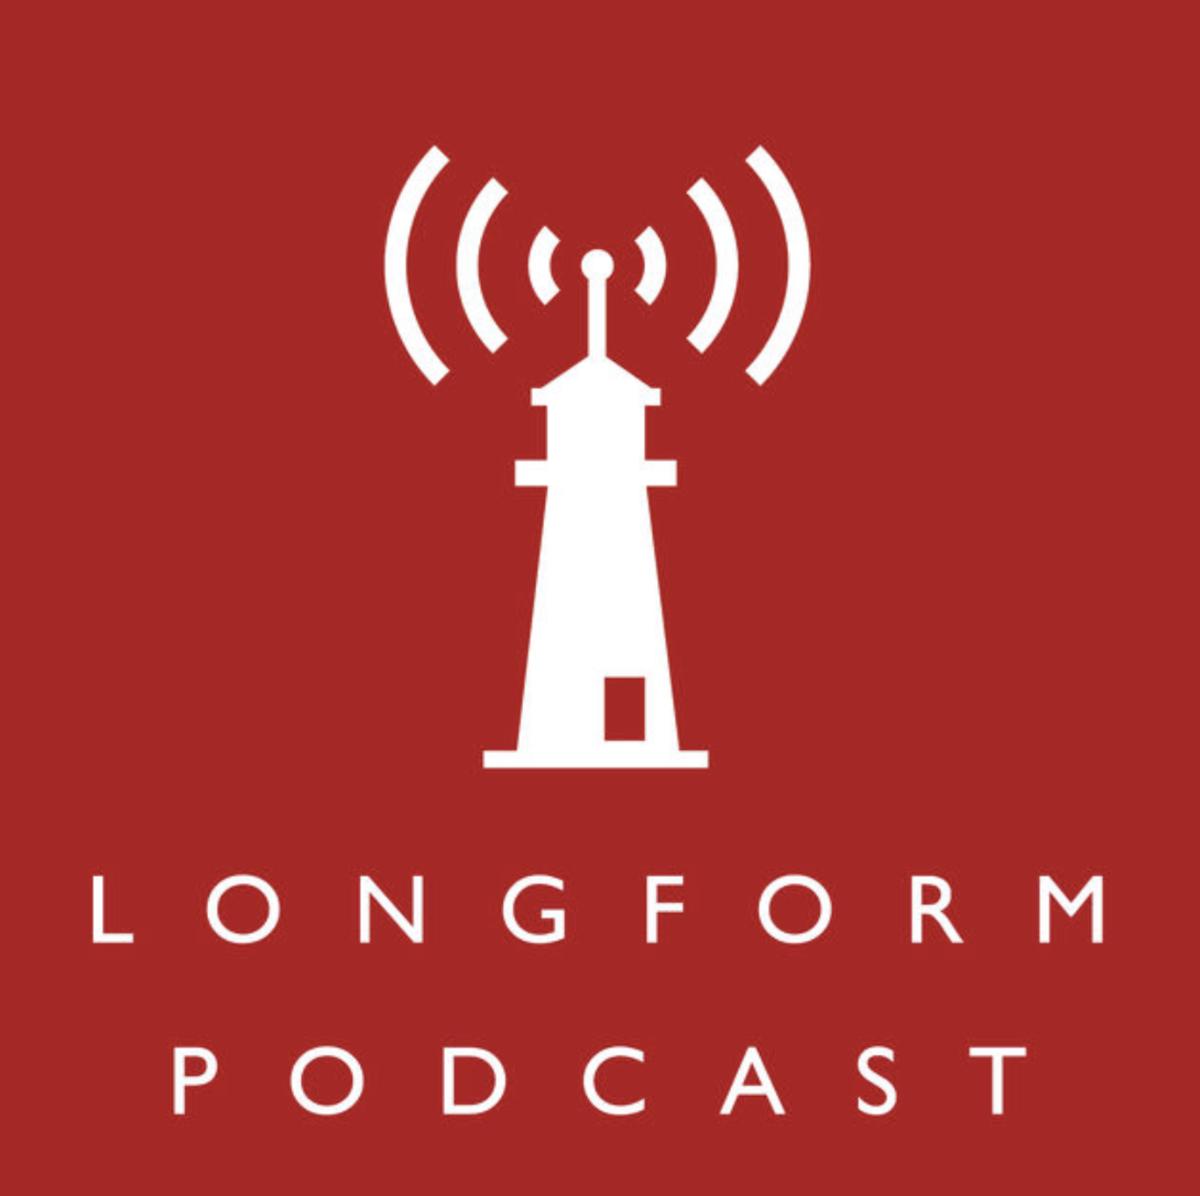 The Longform Podcast